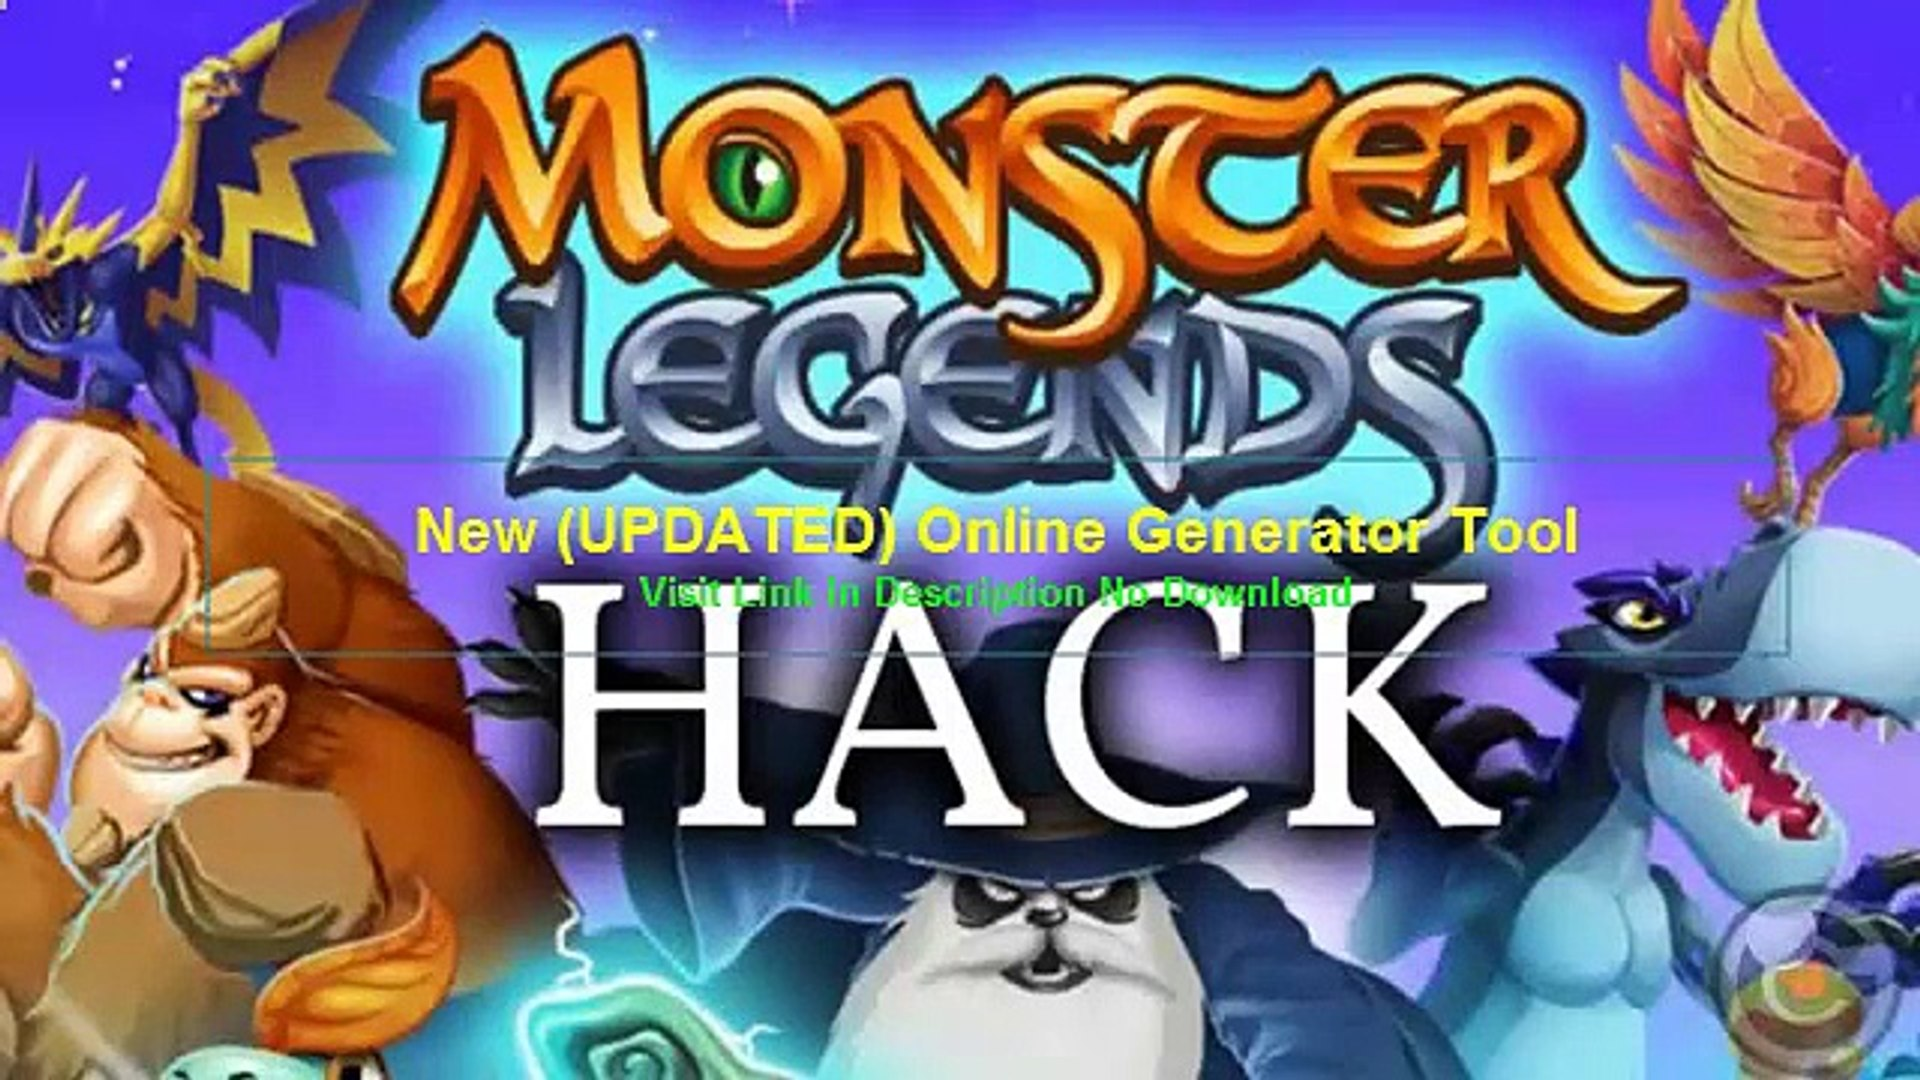 Monster Legends Illimite Gold Gems Food Outil De Piratage Triche 1 Video Dailymotion